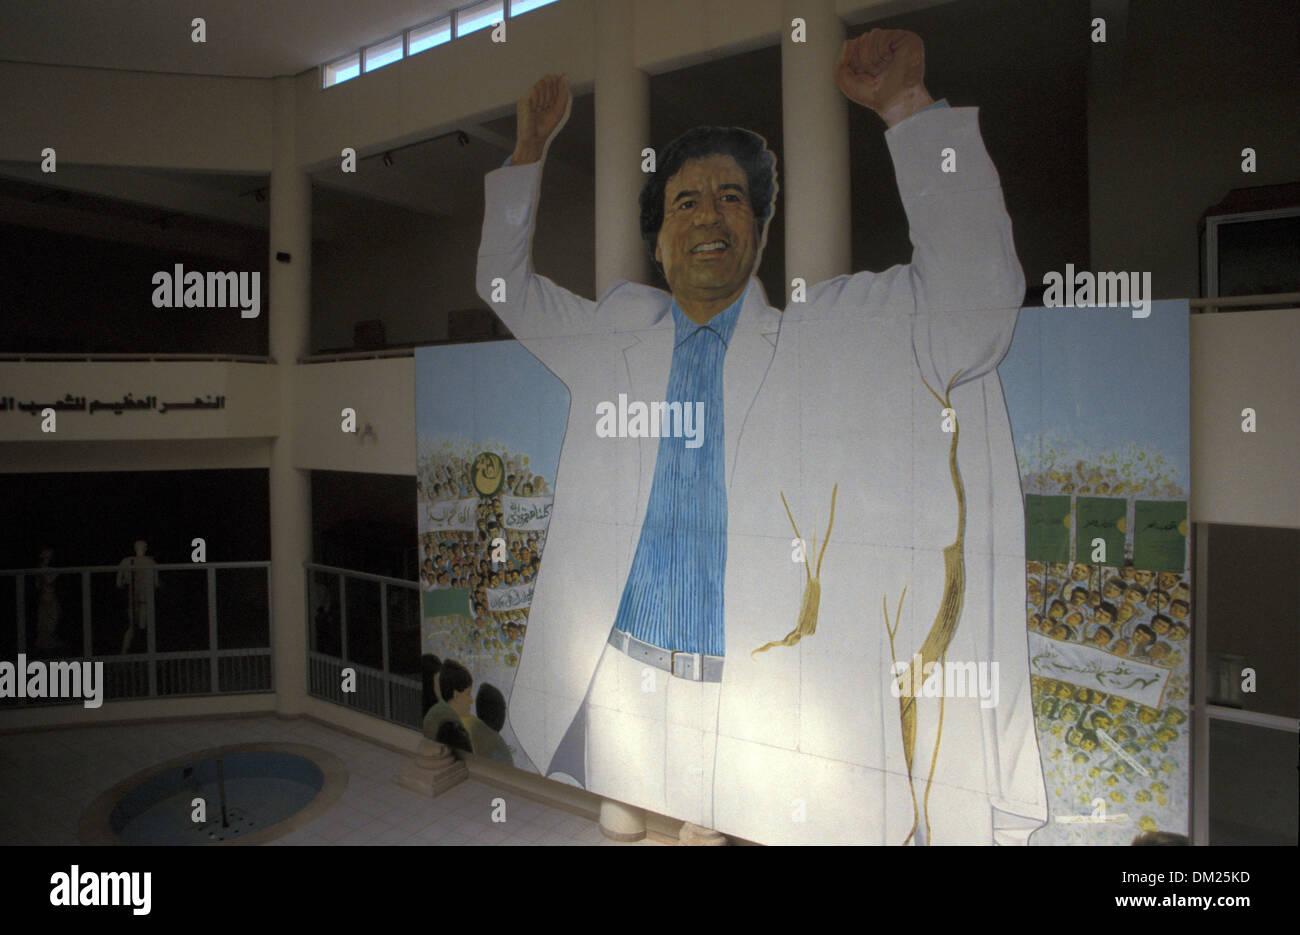 Muamar Muhamad Abu-minyar el Gadafi  poster in the archaeological Museum of Leptis Magna, - Stock Image